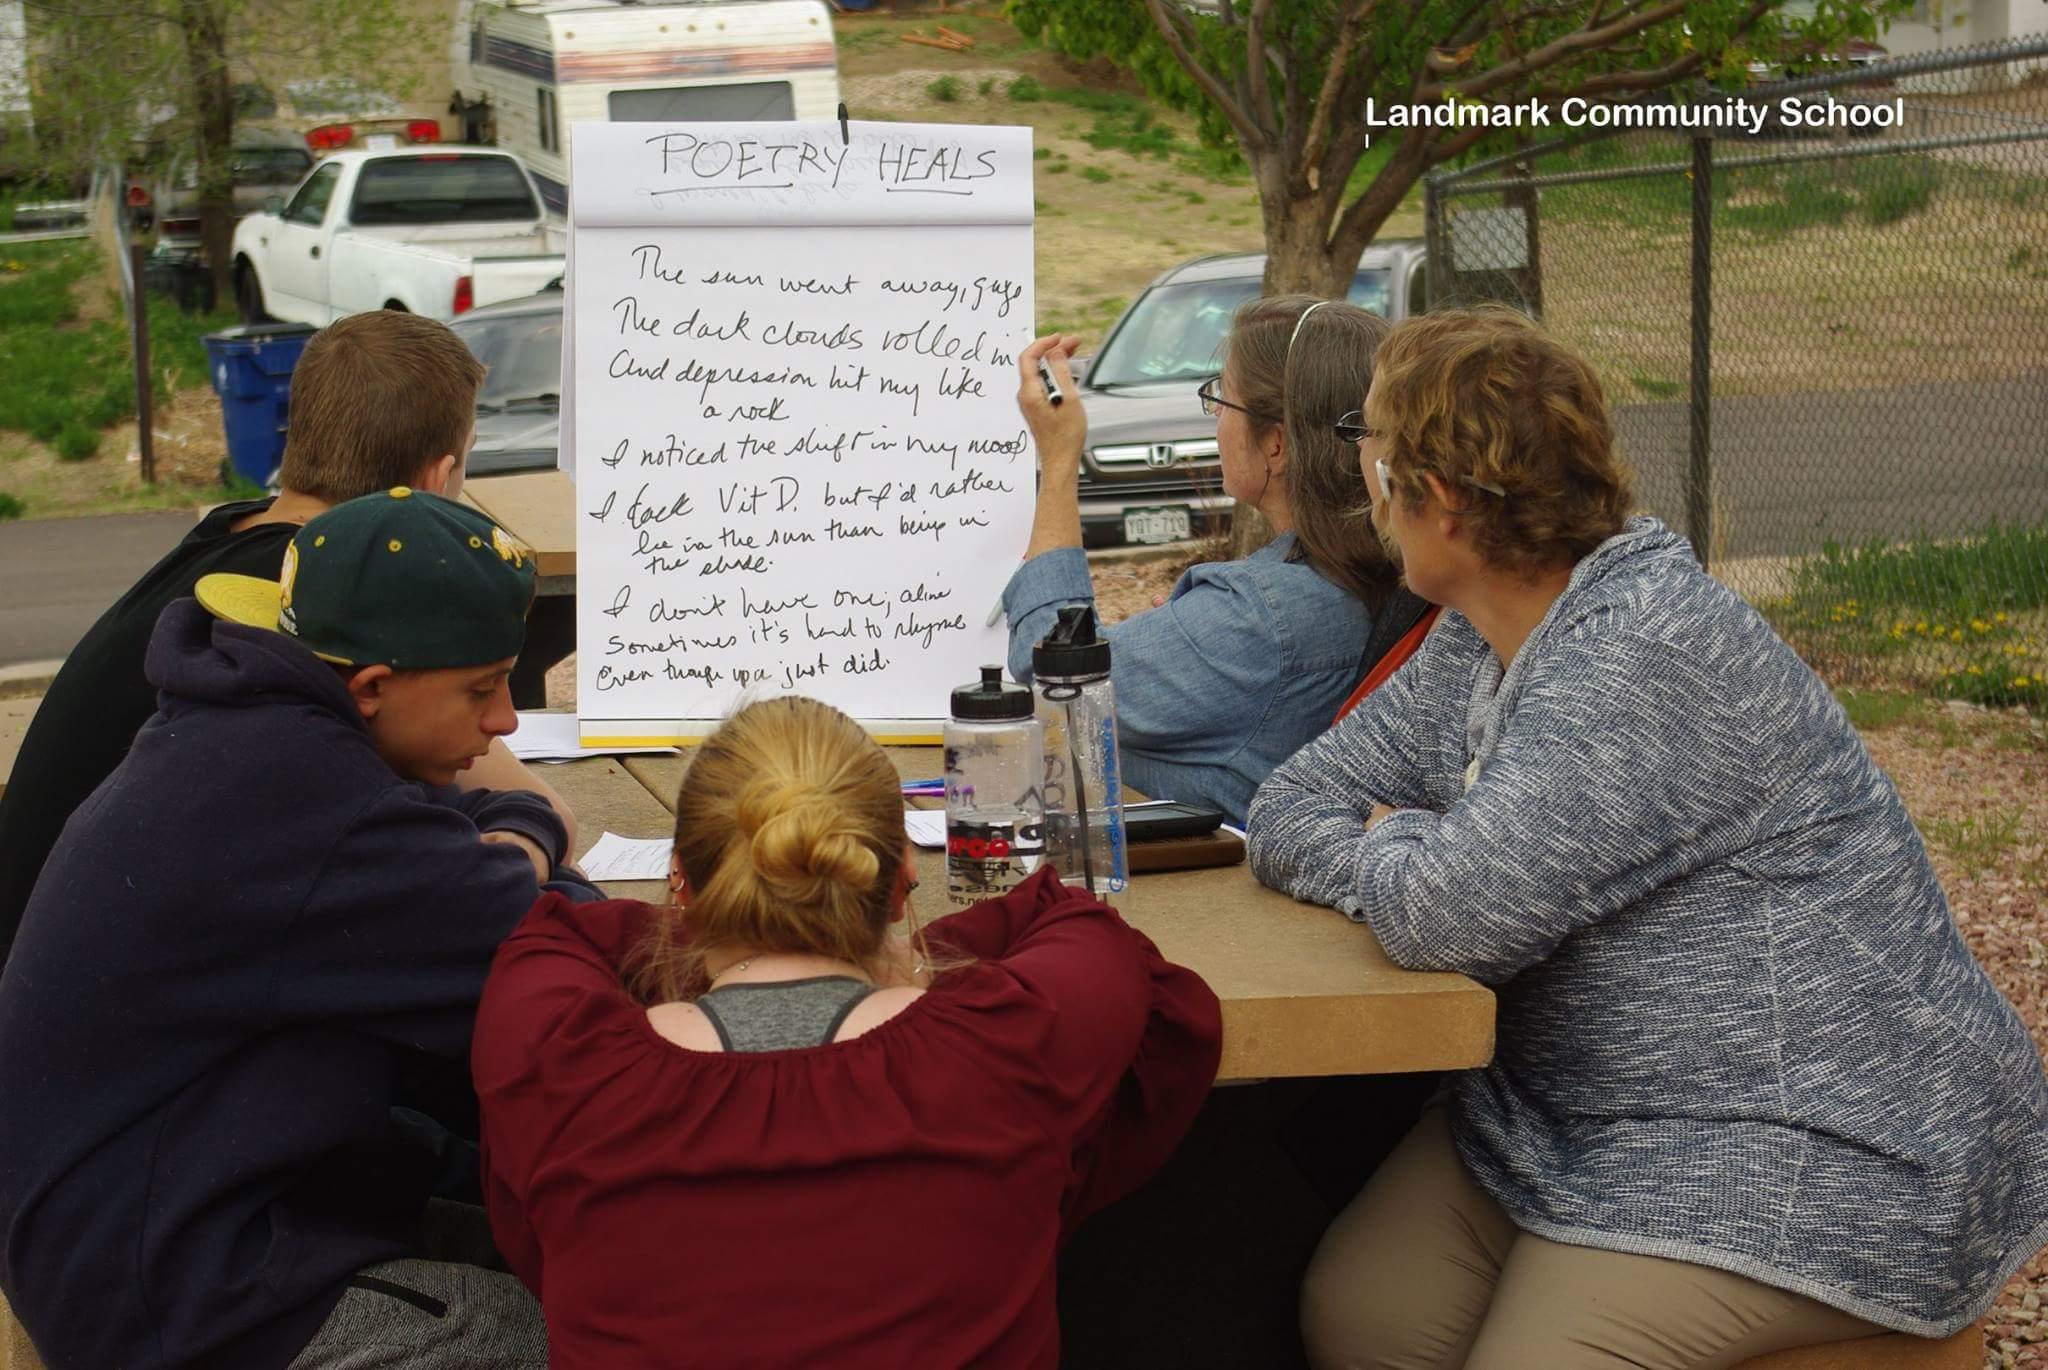 Landmark Community School